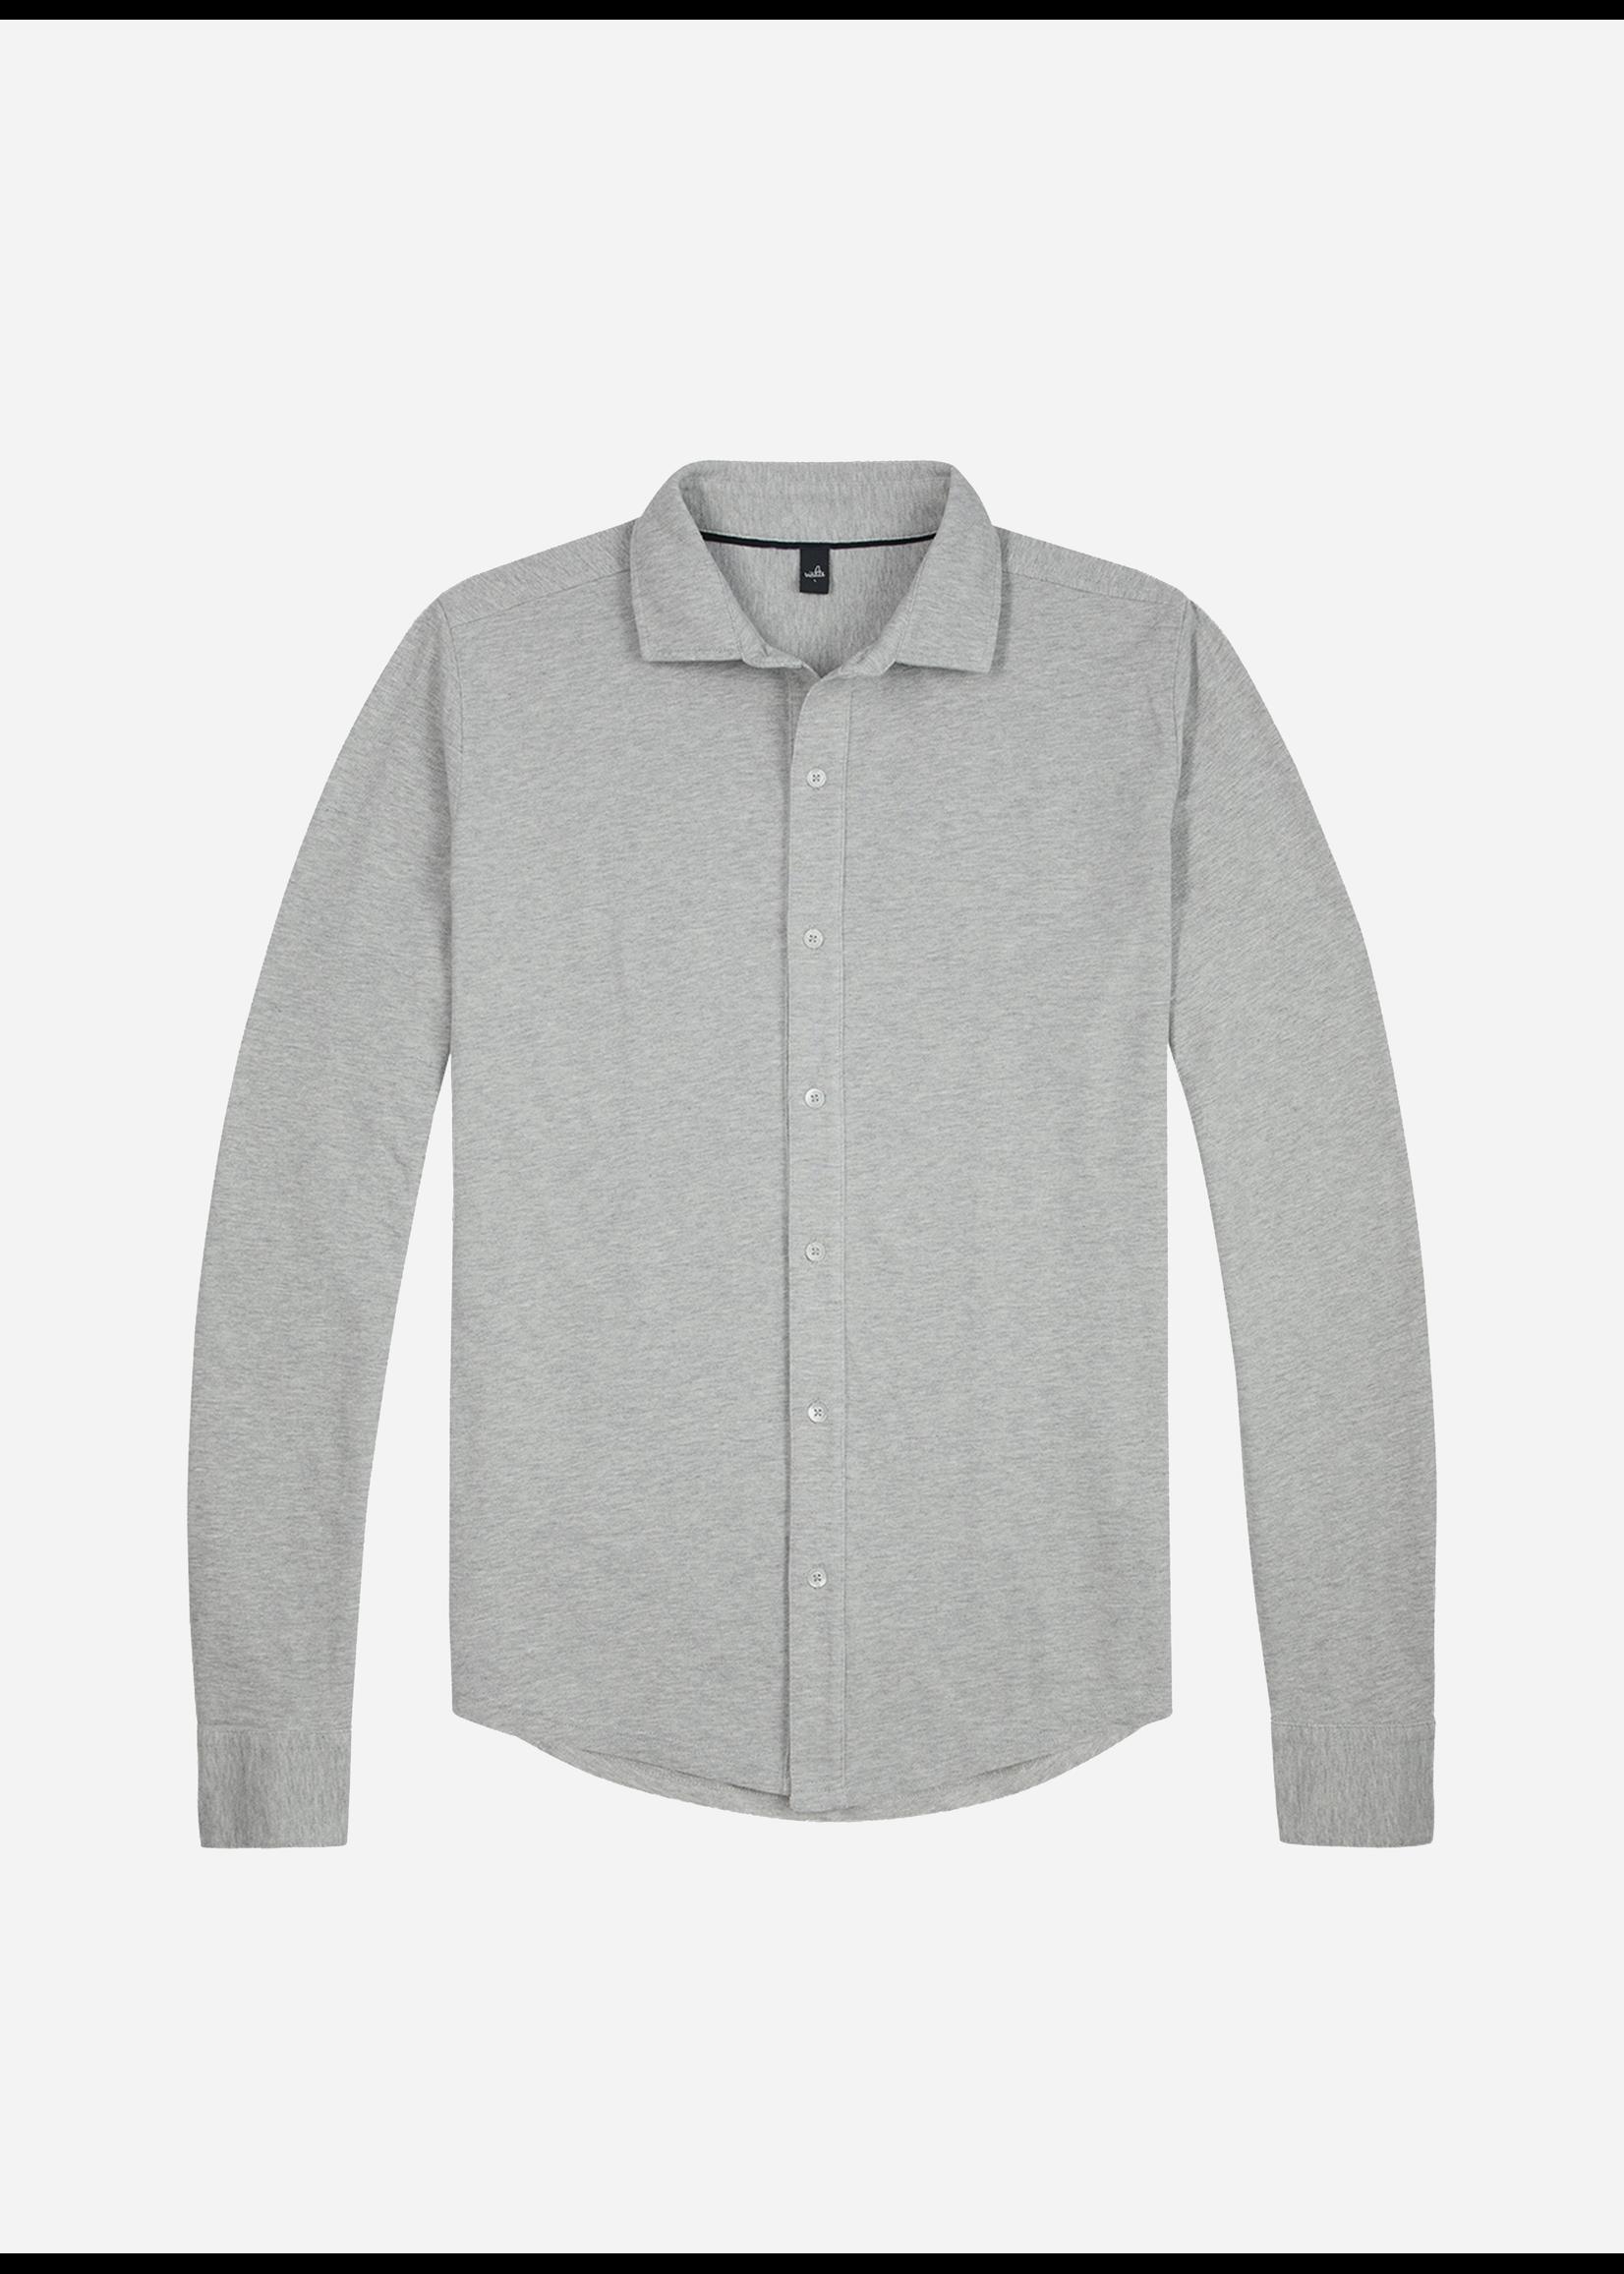 Wahts Barton Tailored Jersey Shirt Light Grey